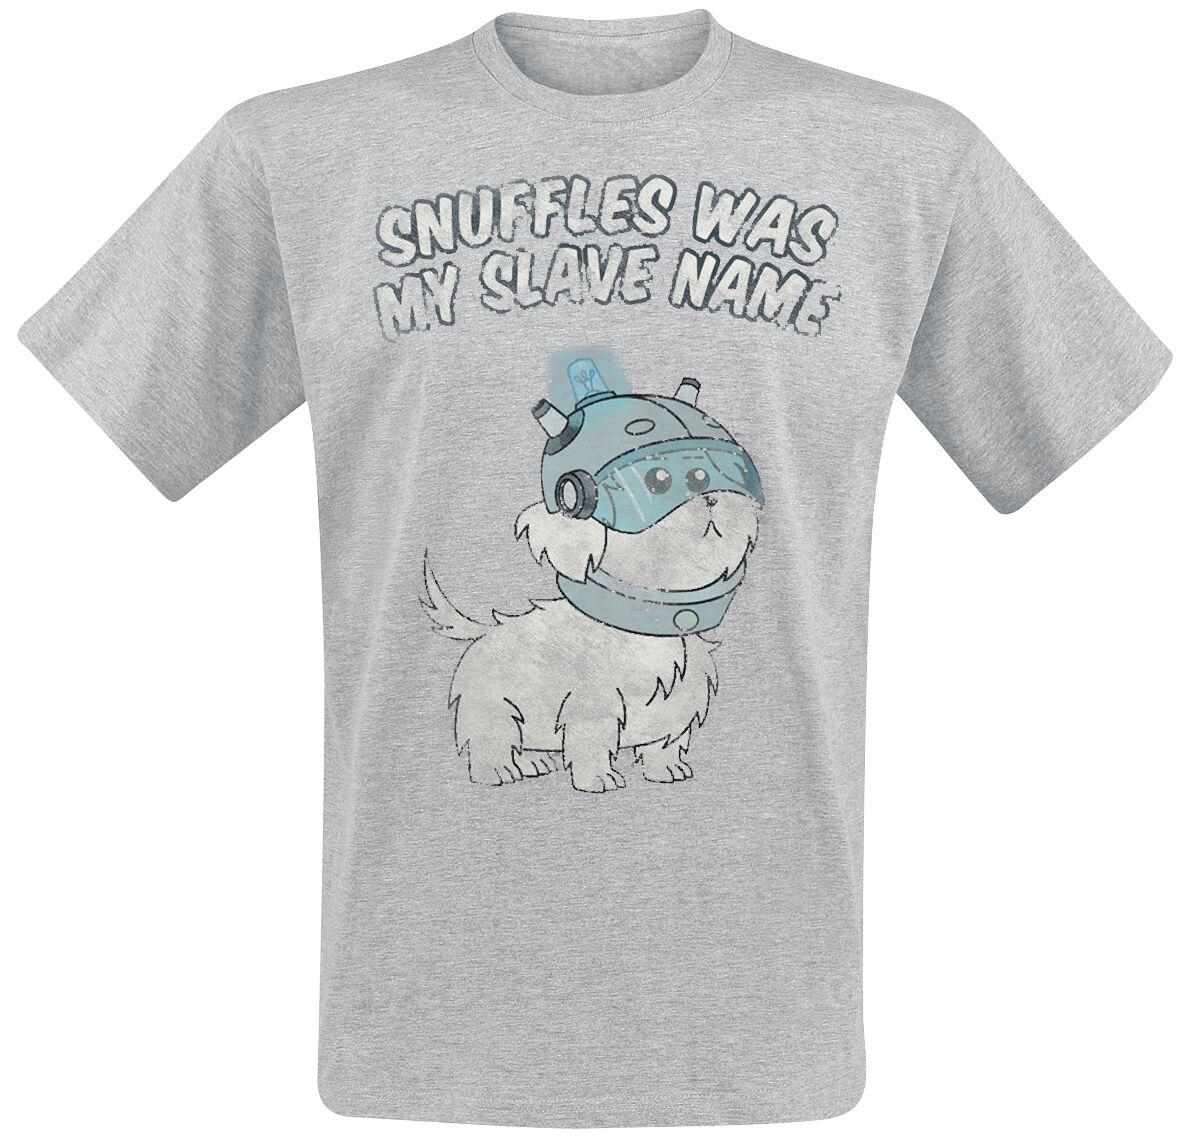 Image of   Rick And Morty Snuffles T-Shirt grålig